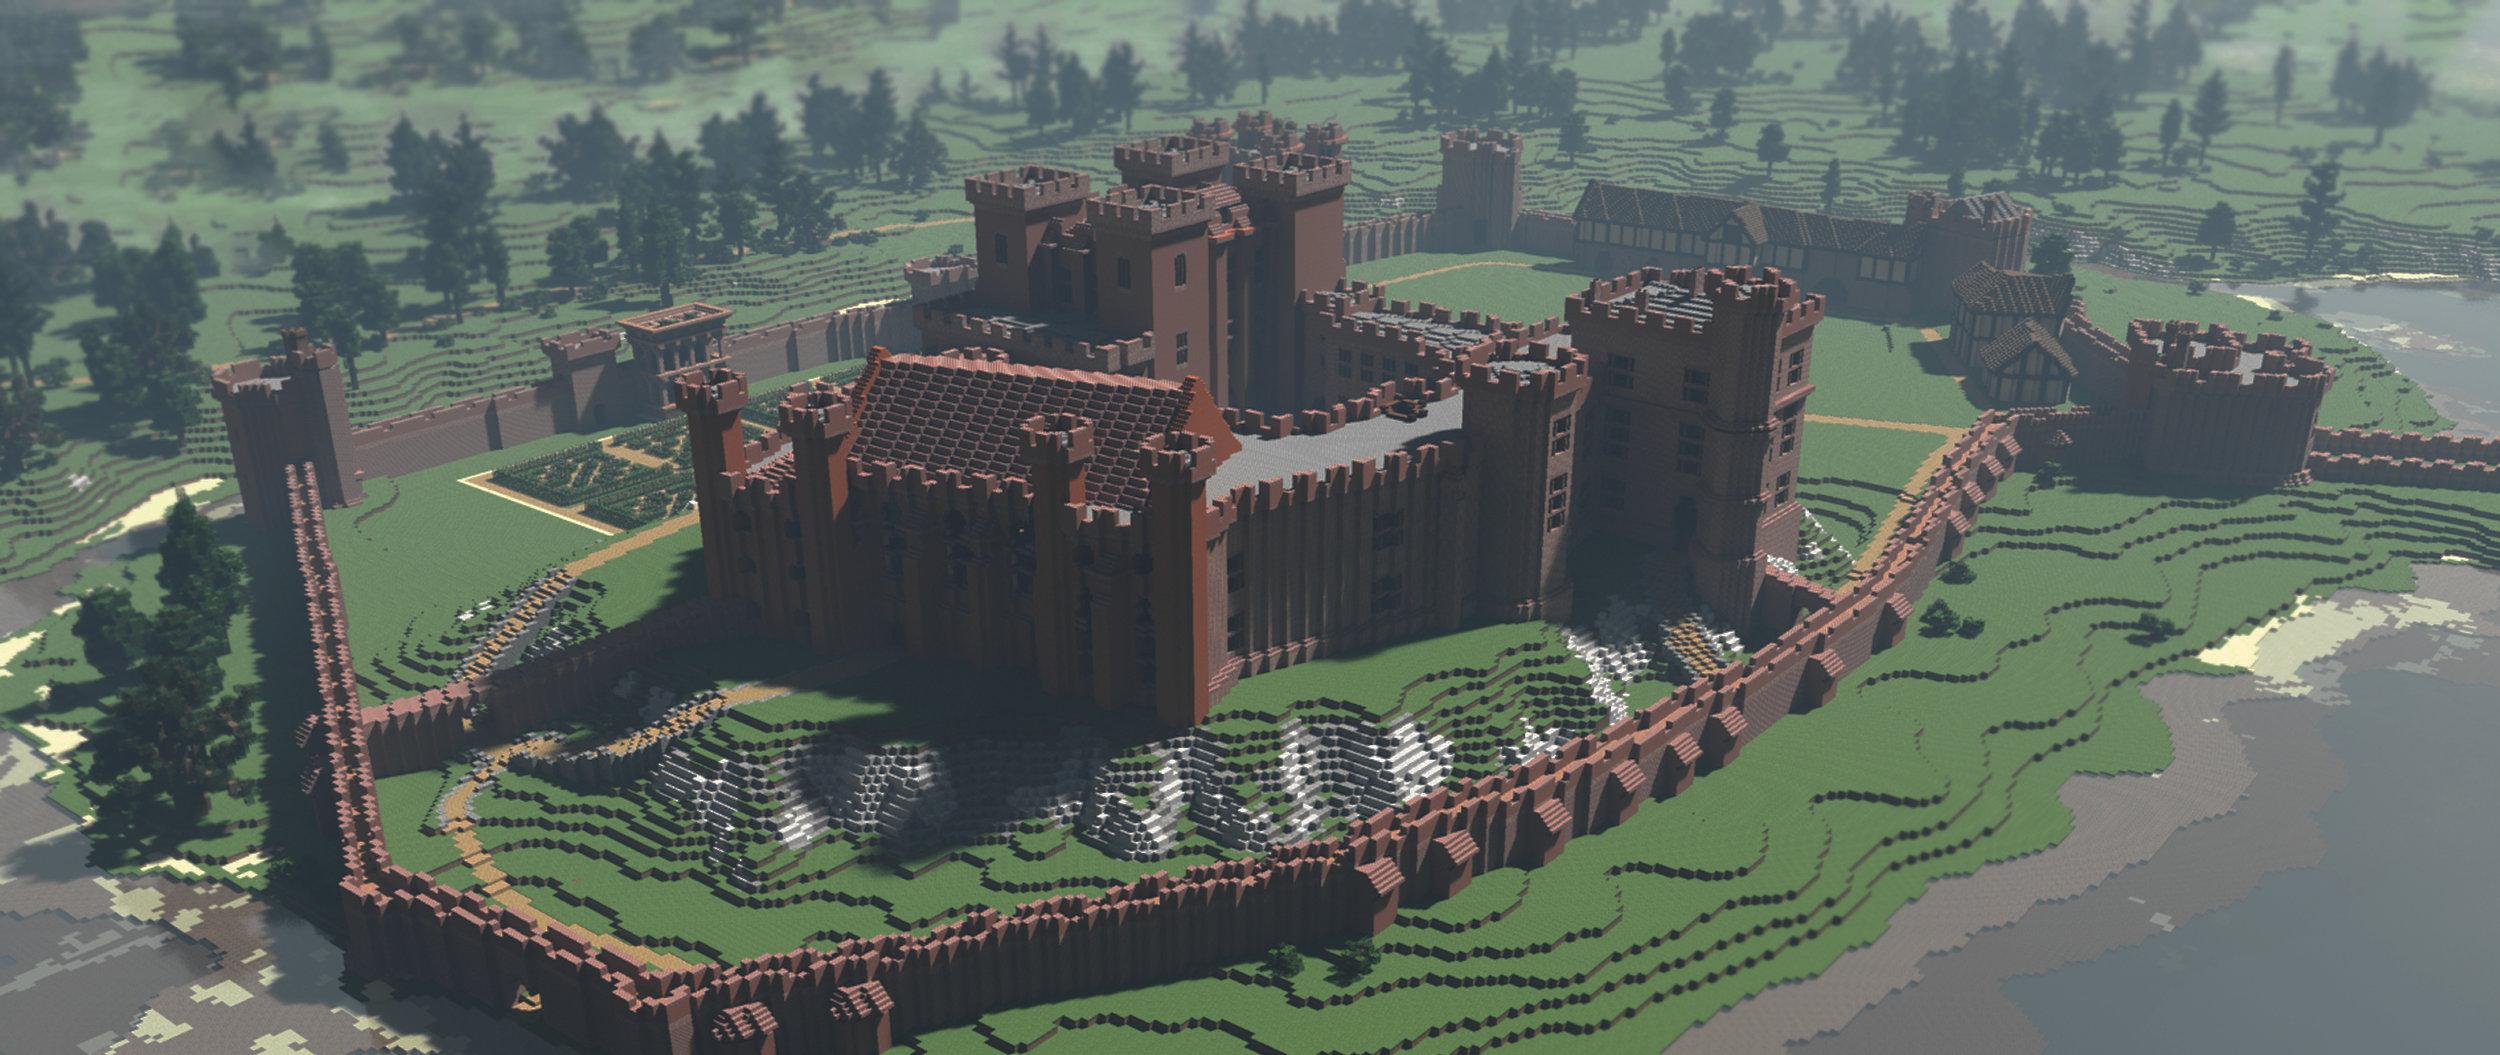 CastleCraft - English Heritage